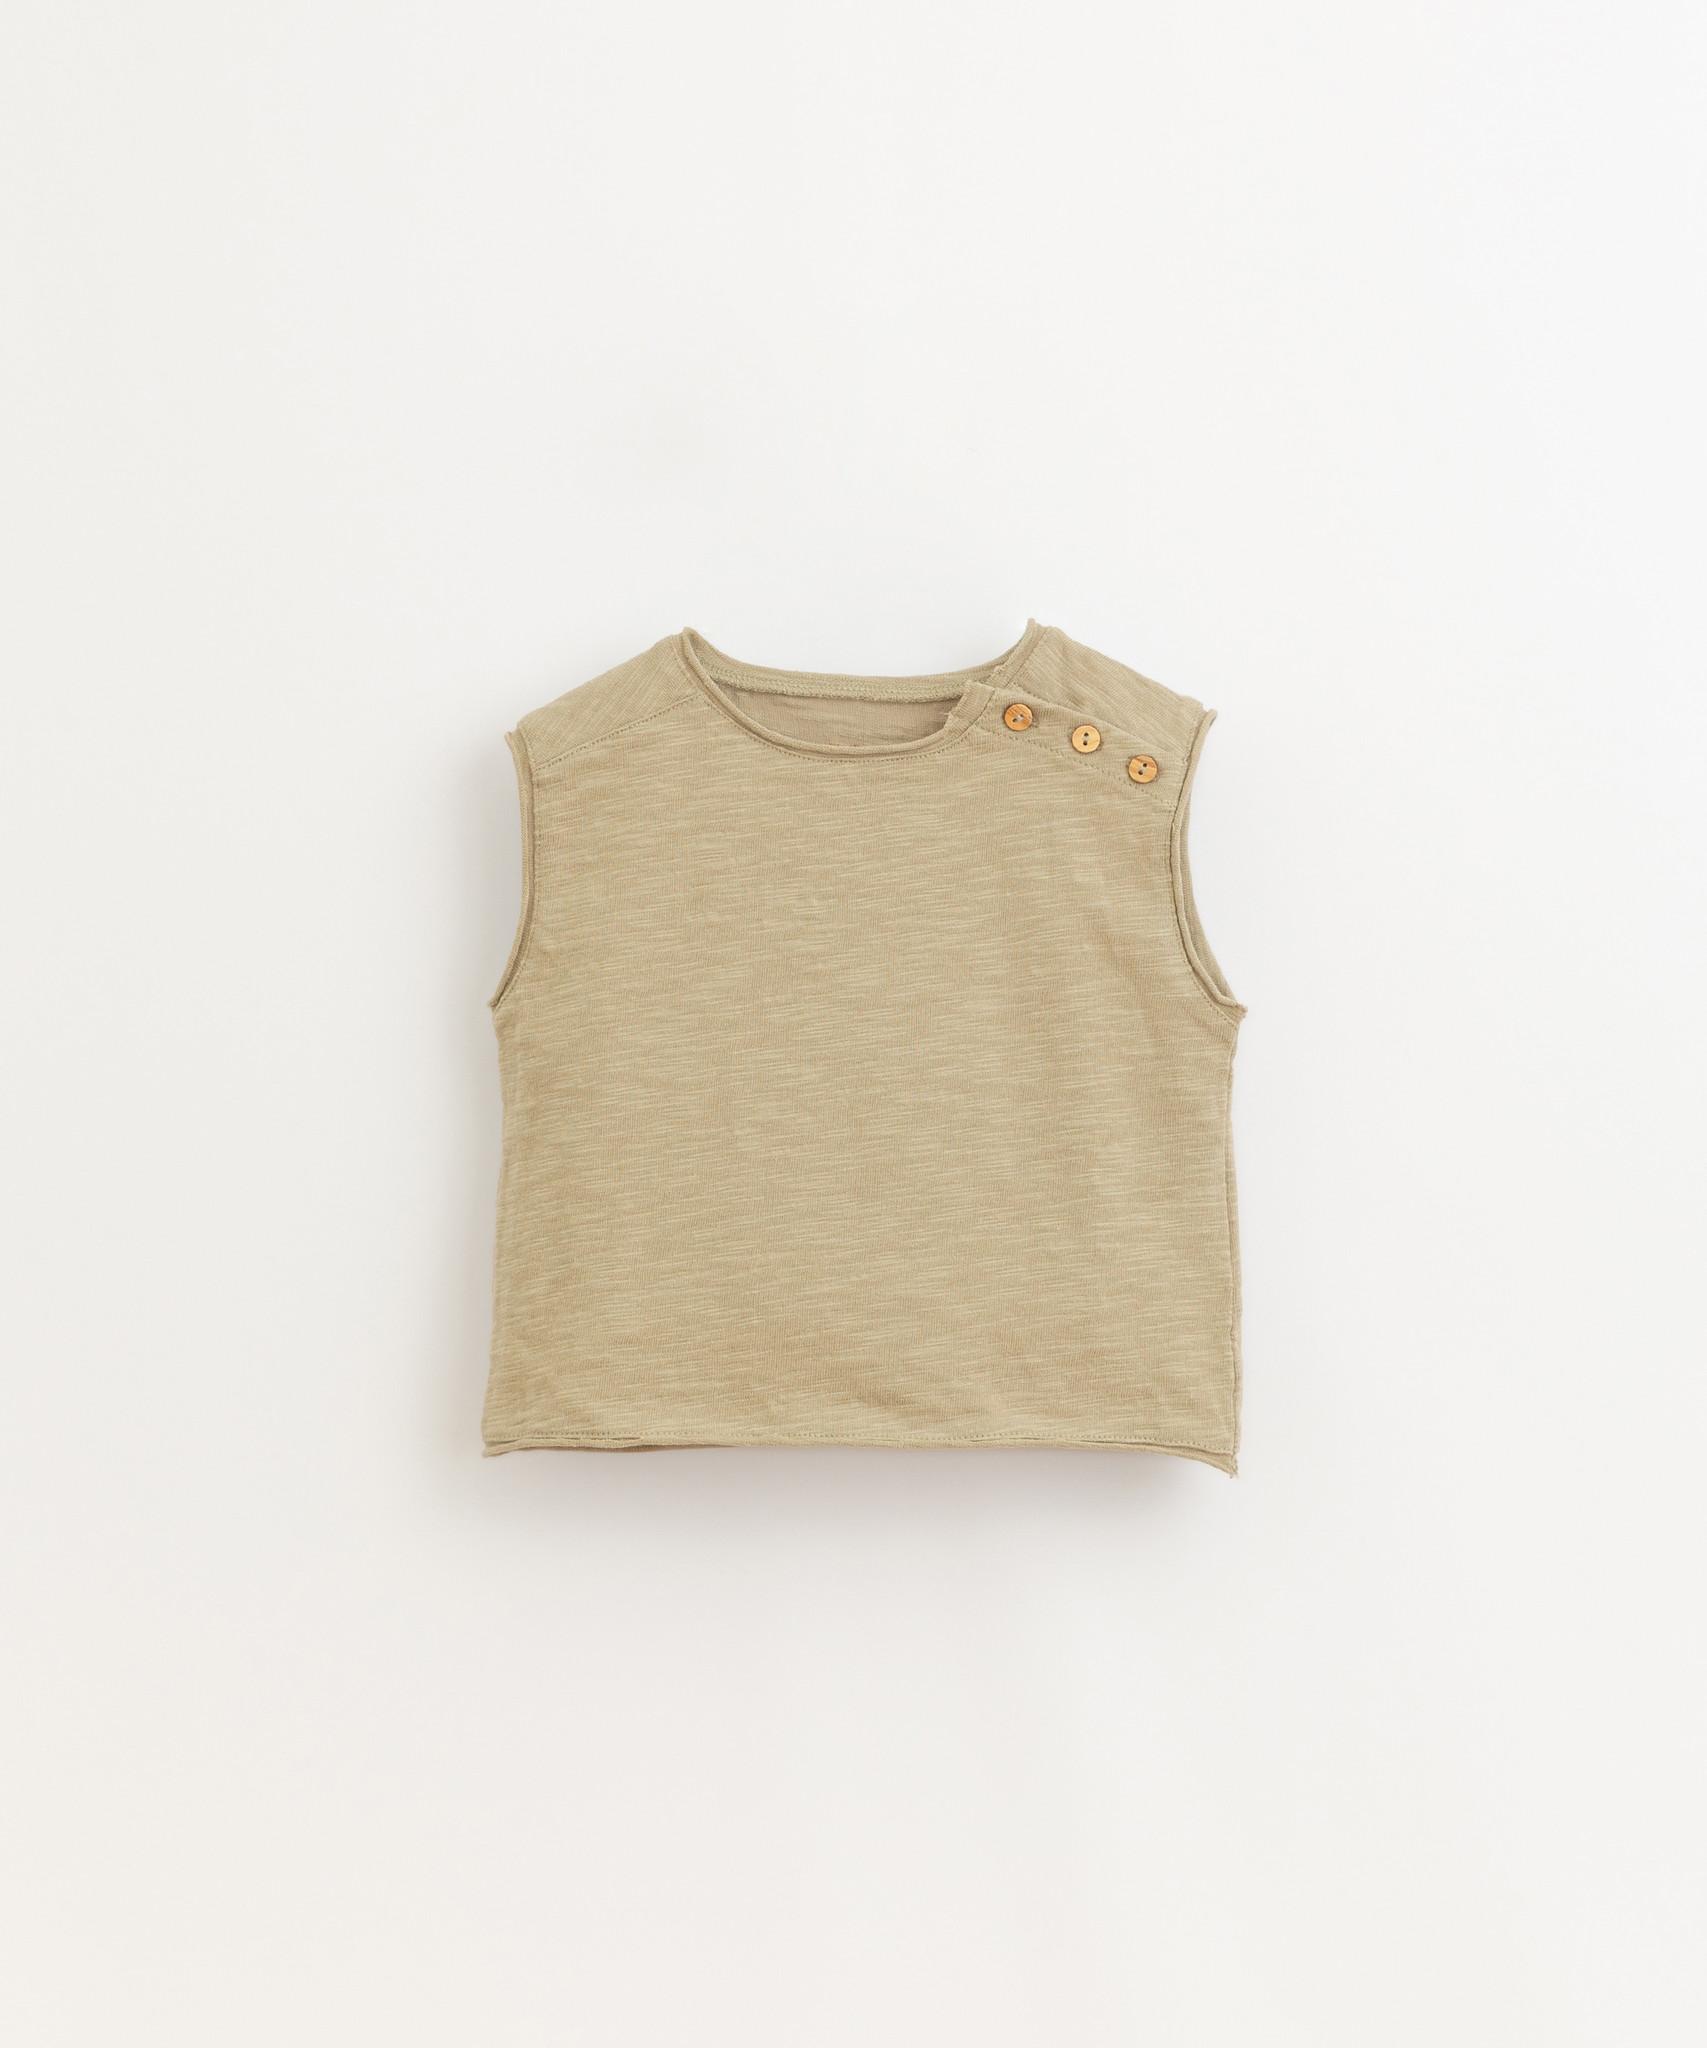 Play-up Flame jersey sleeveless t-shirt| Joao